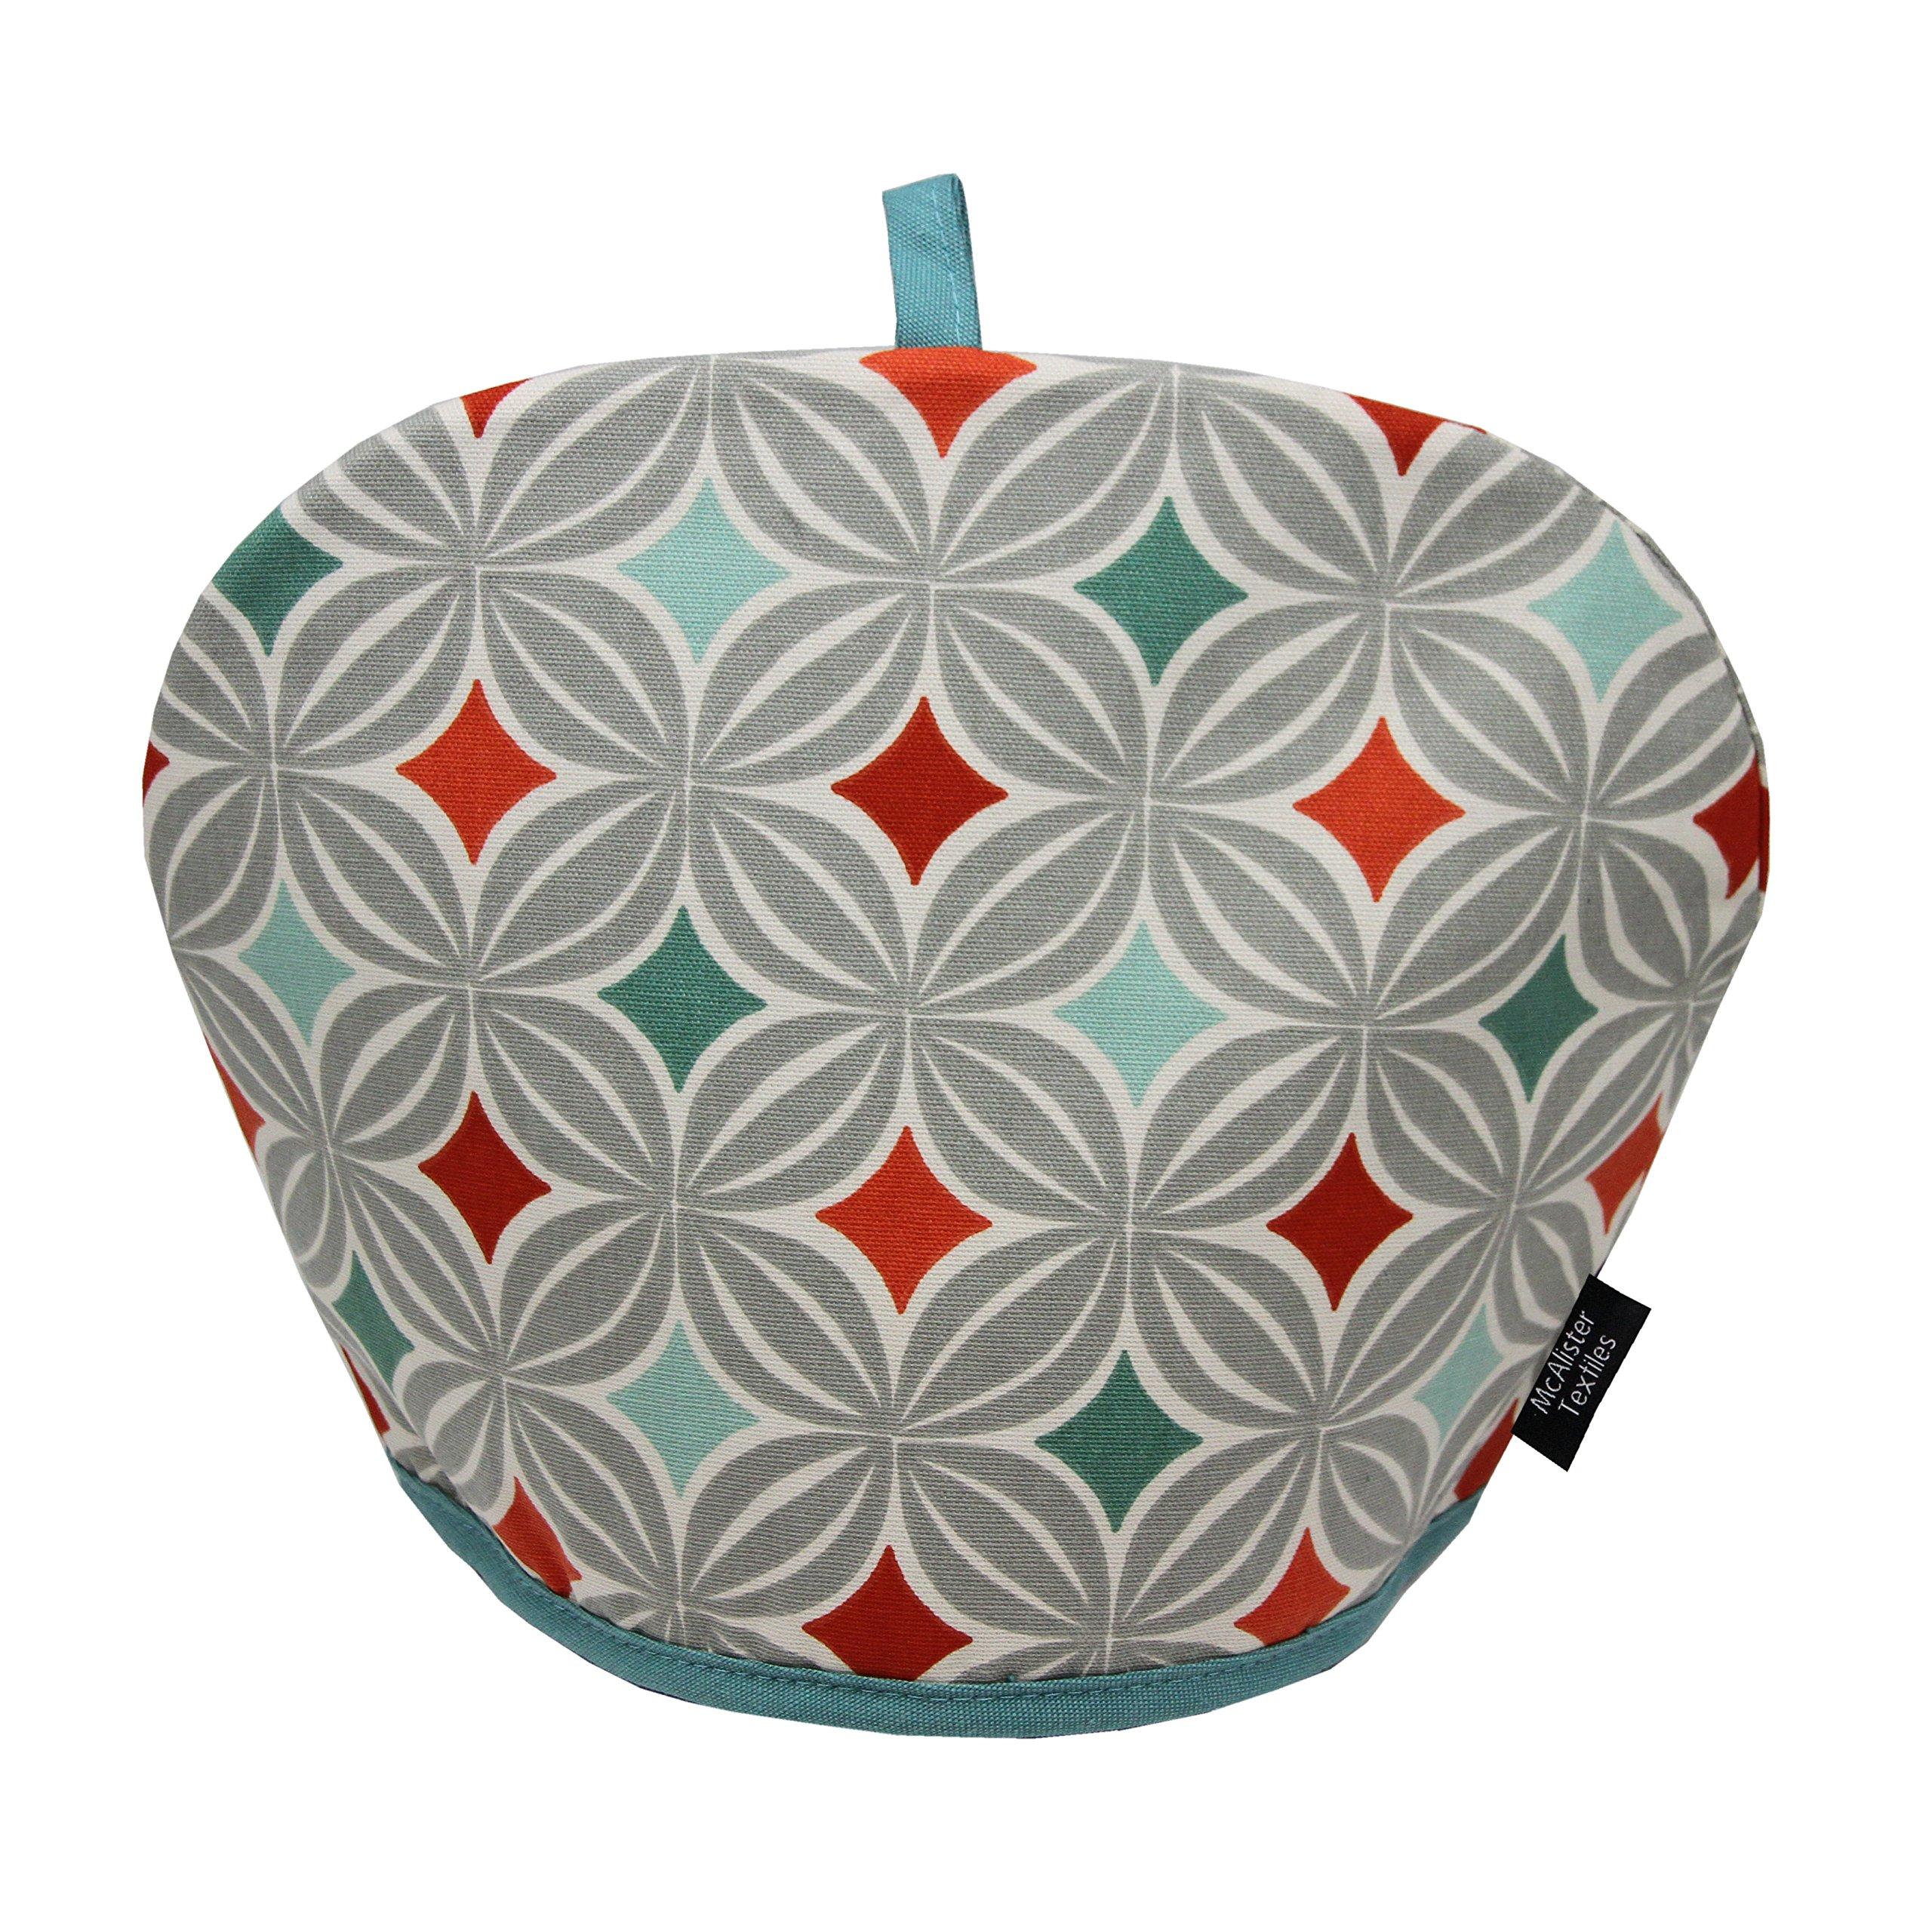 McAlister Laila Designer Decor Tea Cozy Kettle Cover | Terracotta Burnt Orange 100% Cotton | Modern Scandinavian Minimalist Accent